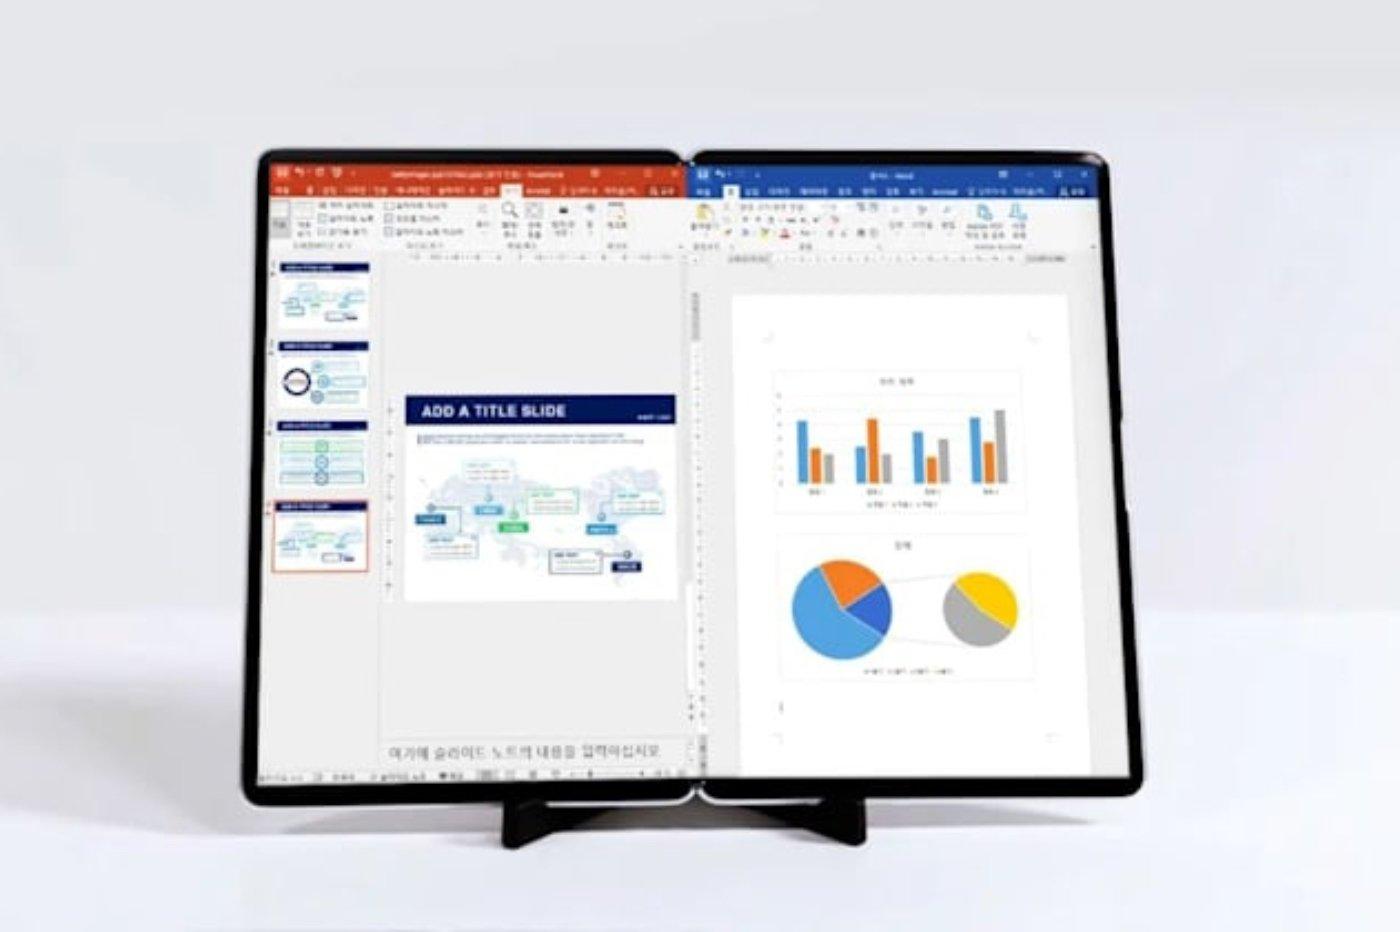 Samsung folding screen tablet